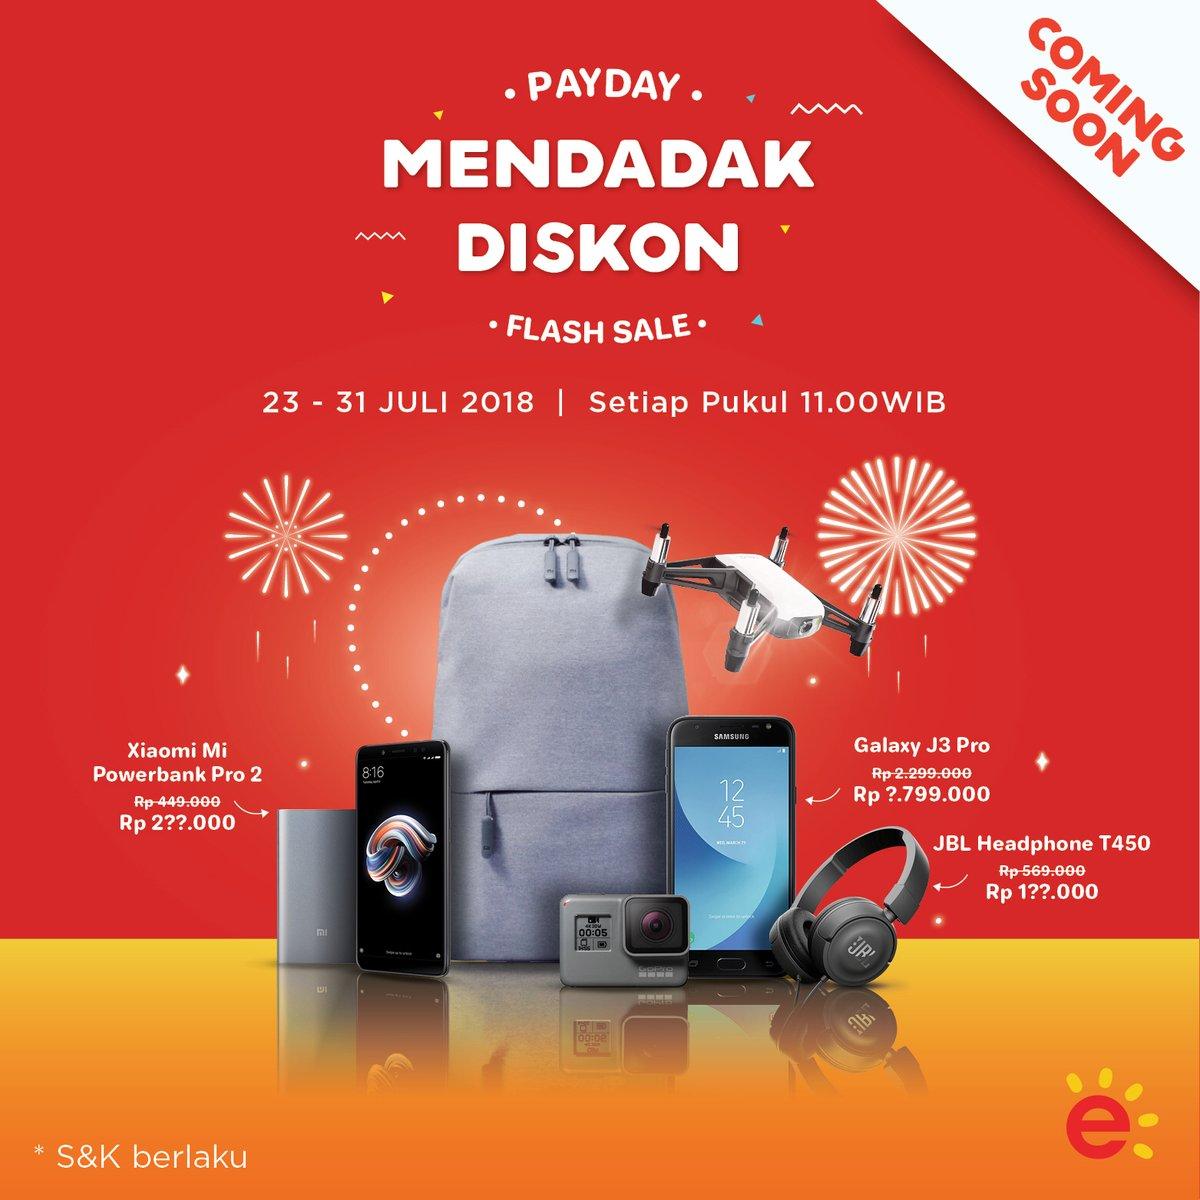 Erafone - Promo Pay Day Mendadak Diskon (23 - 31 Juli 2018)